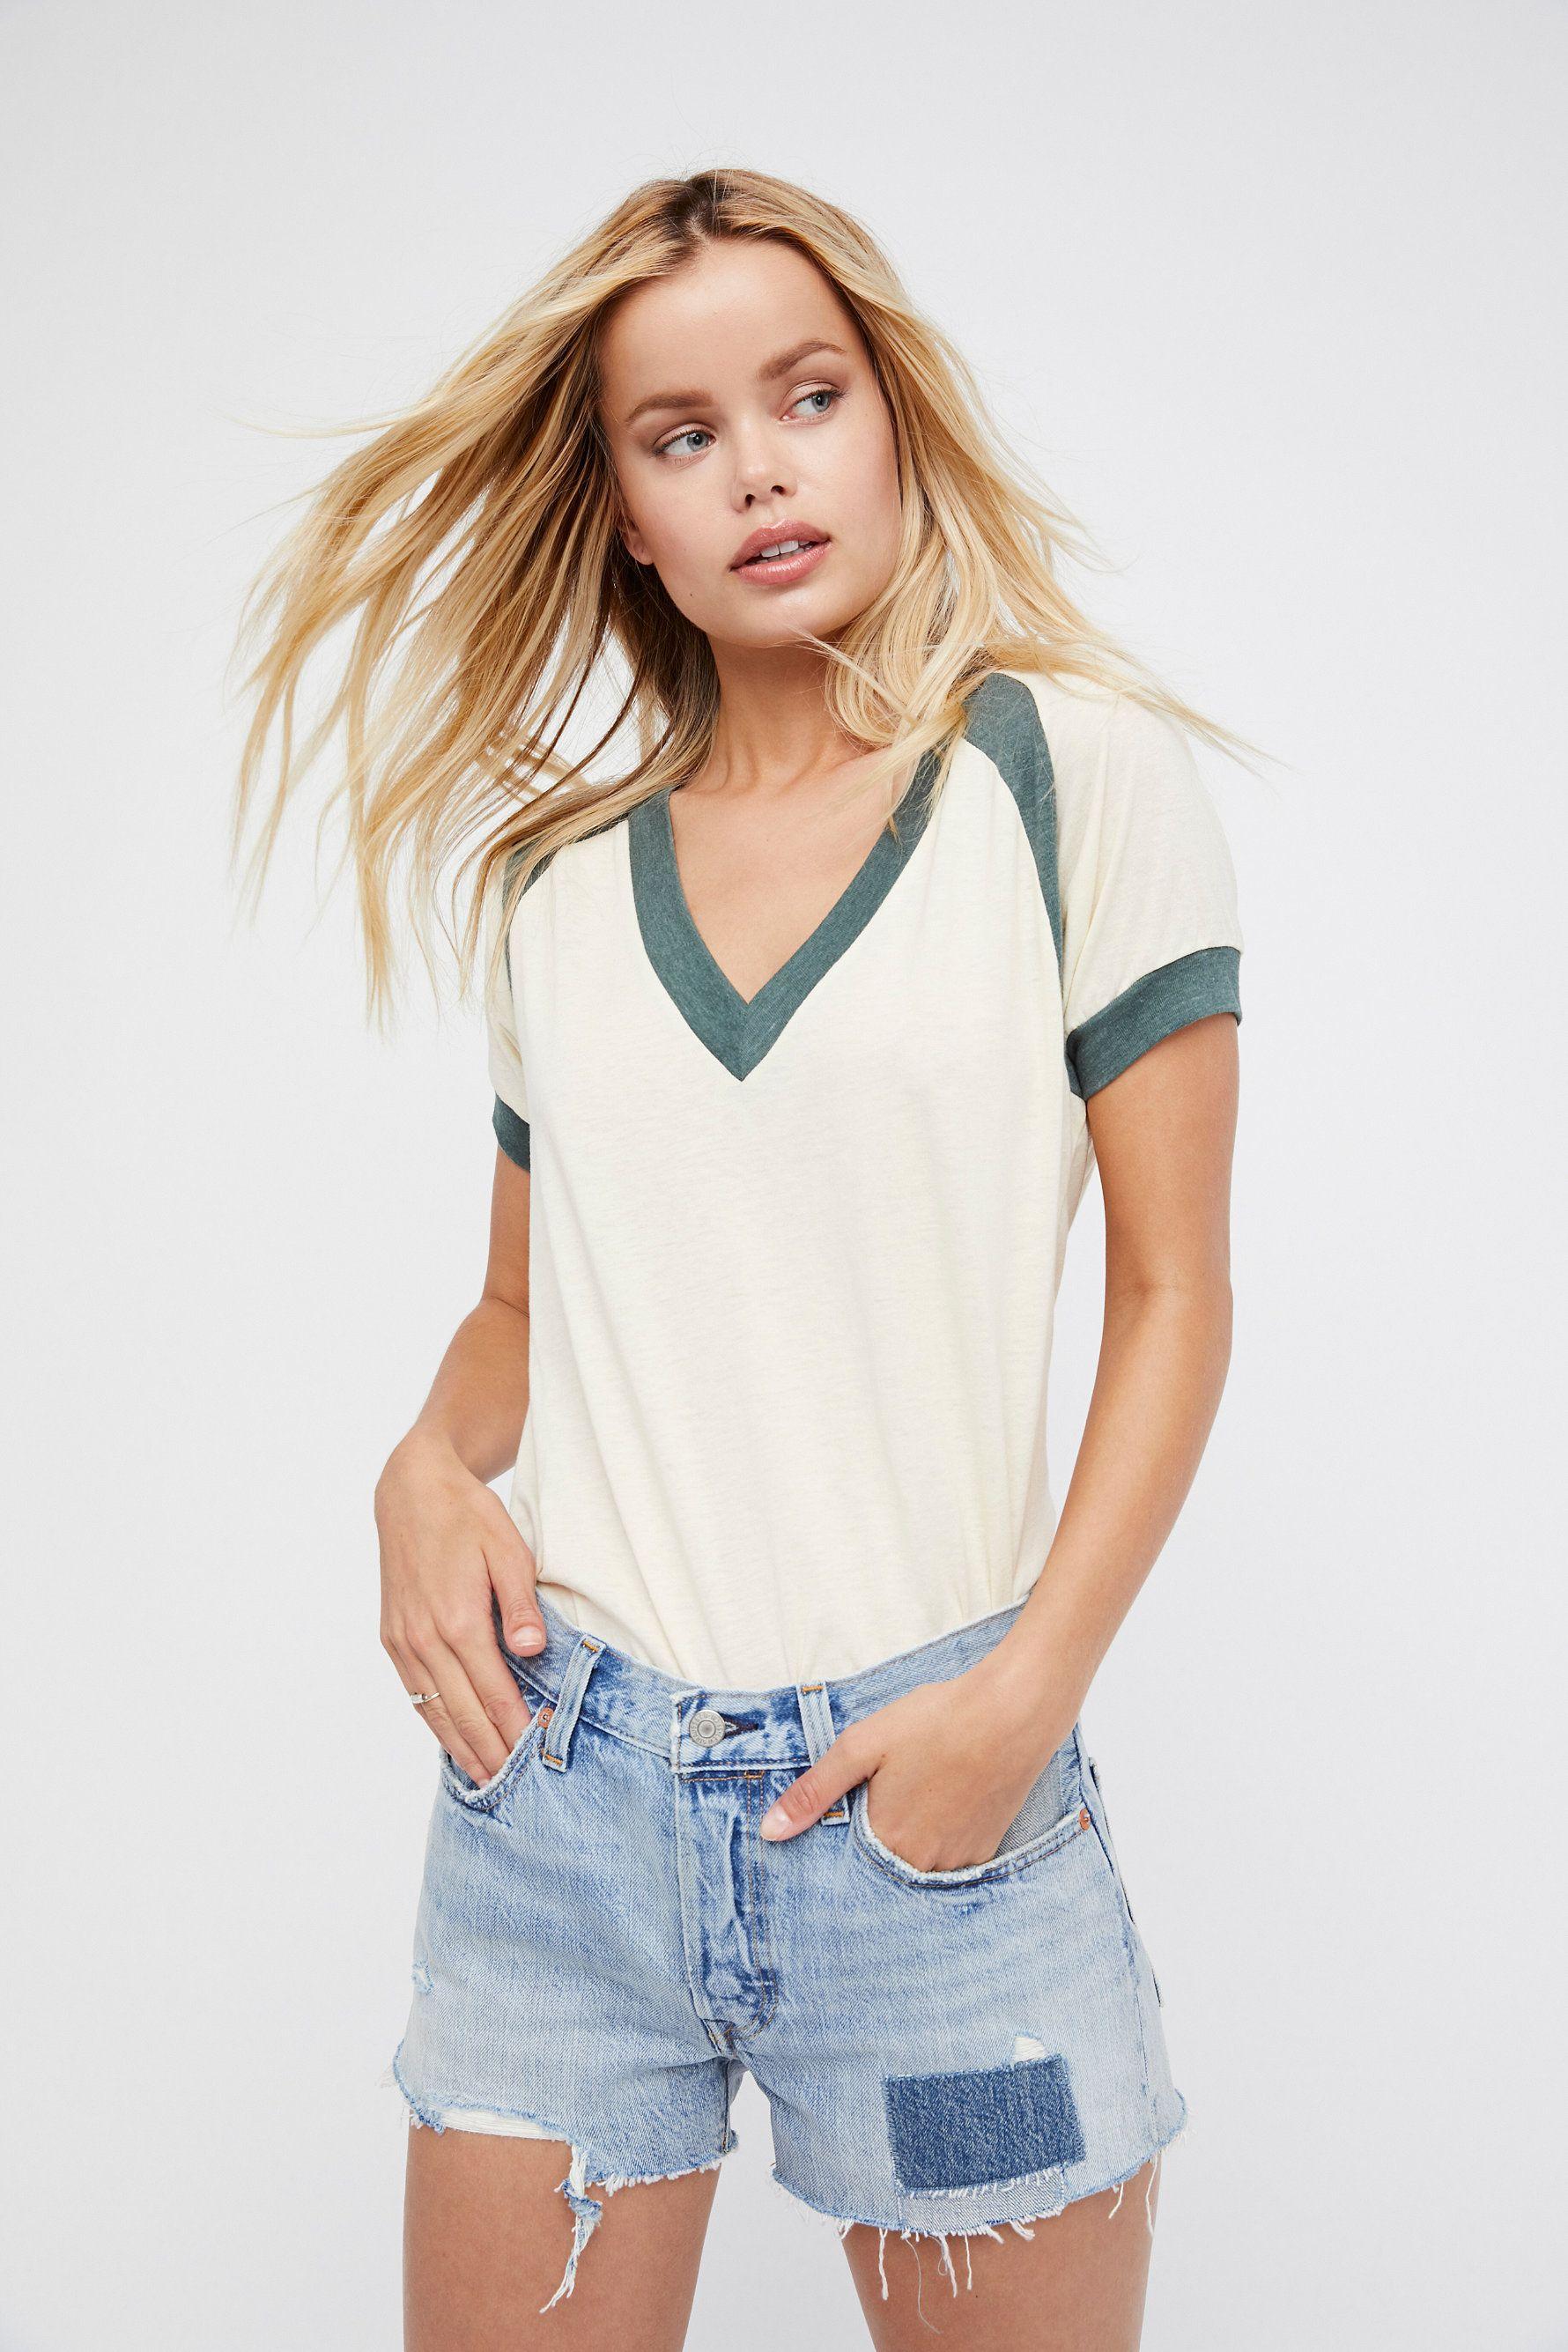 Levi's 501 Cutoff Shorts Women, Super skinny jeans, Fashion